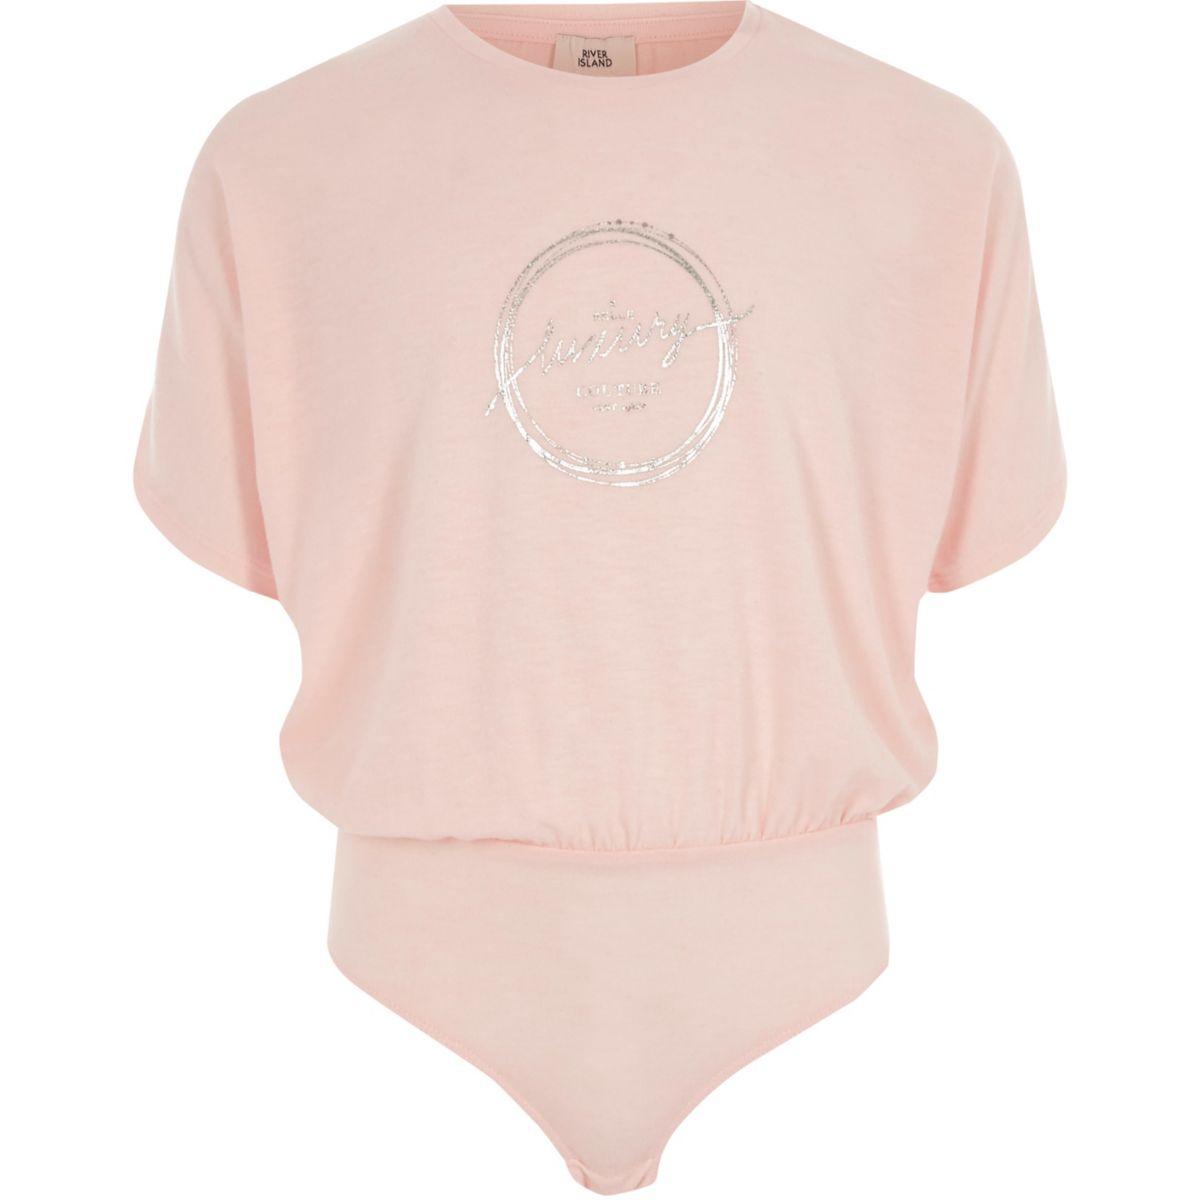 Girls pink jersey 'luxury' print bodysuit